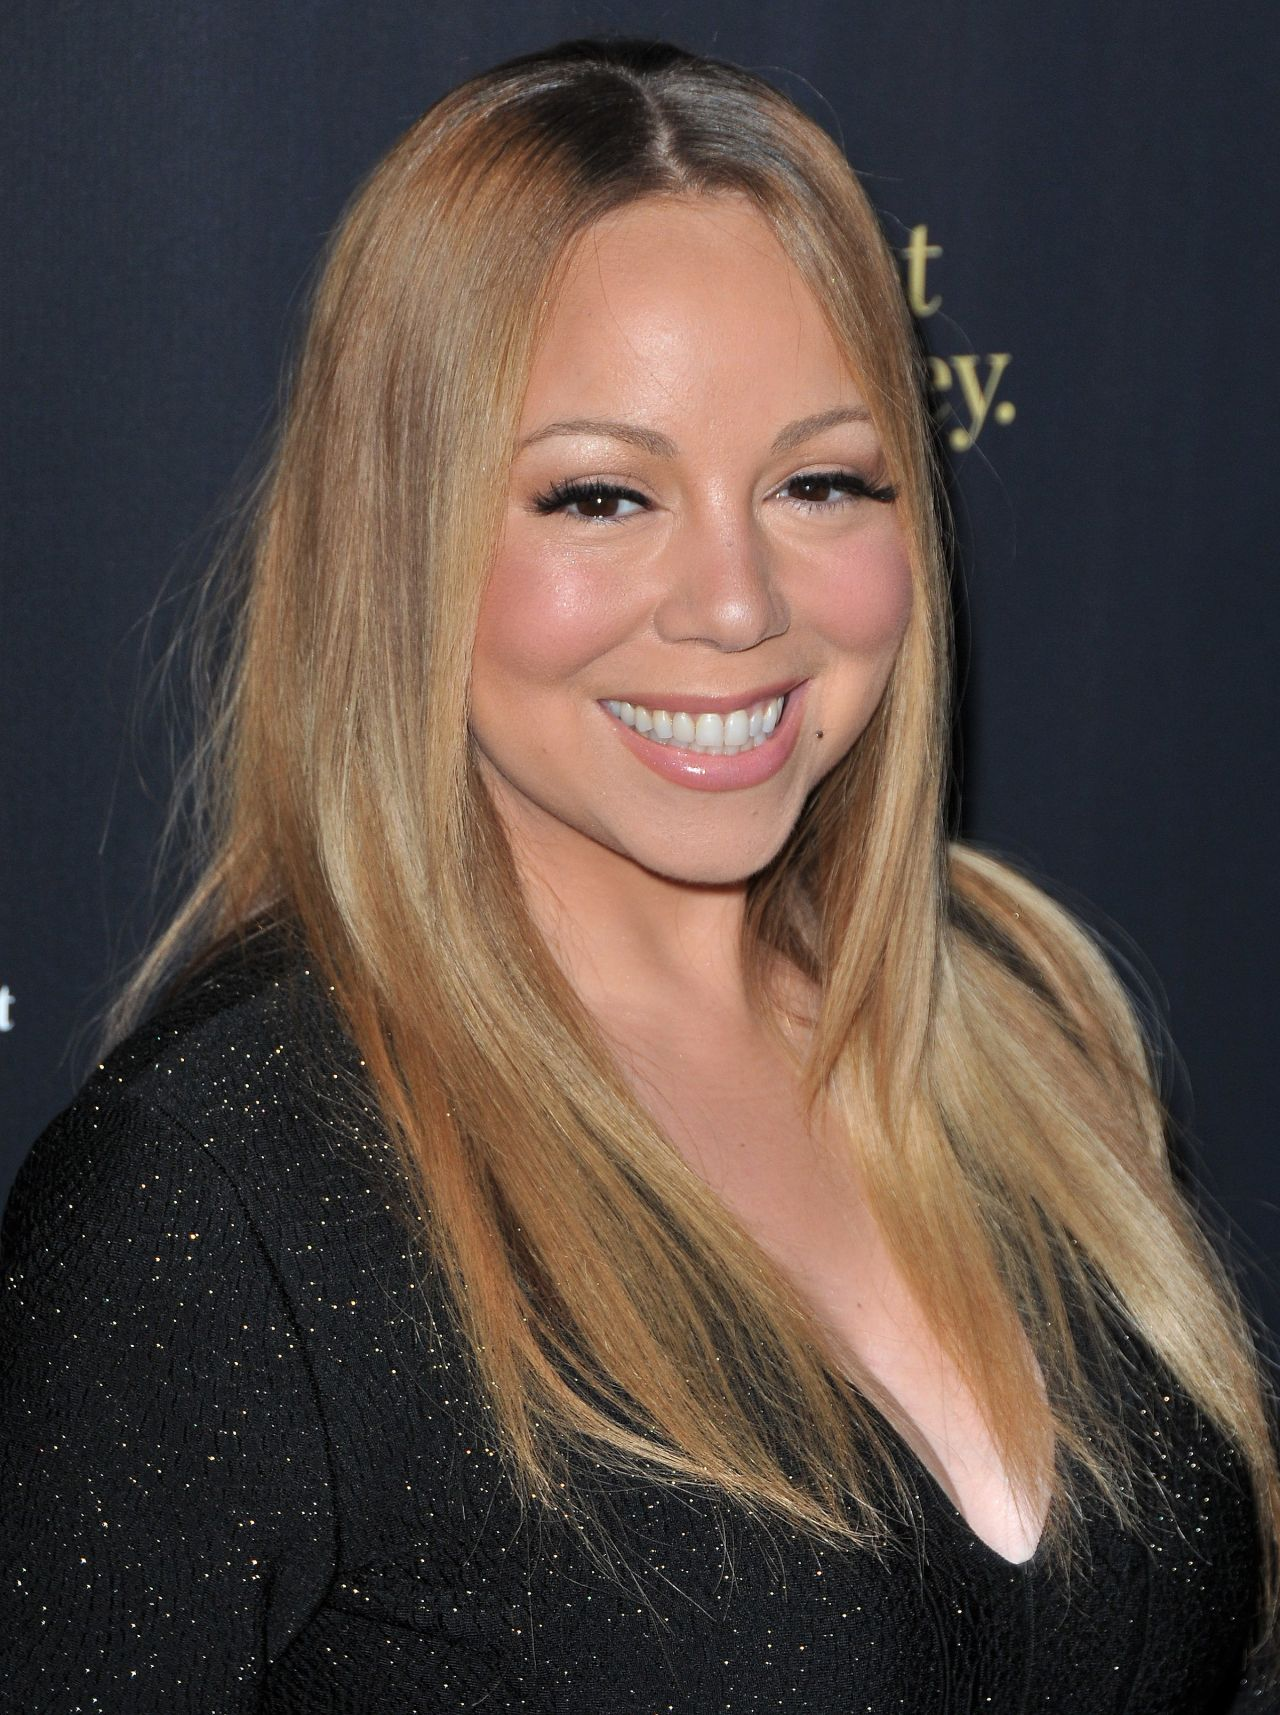 Mariah Carey - 2016 G'Day Los Angeles Gala in Los Angeles, CA Mariah Carey